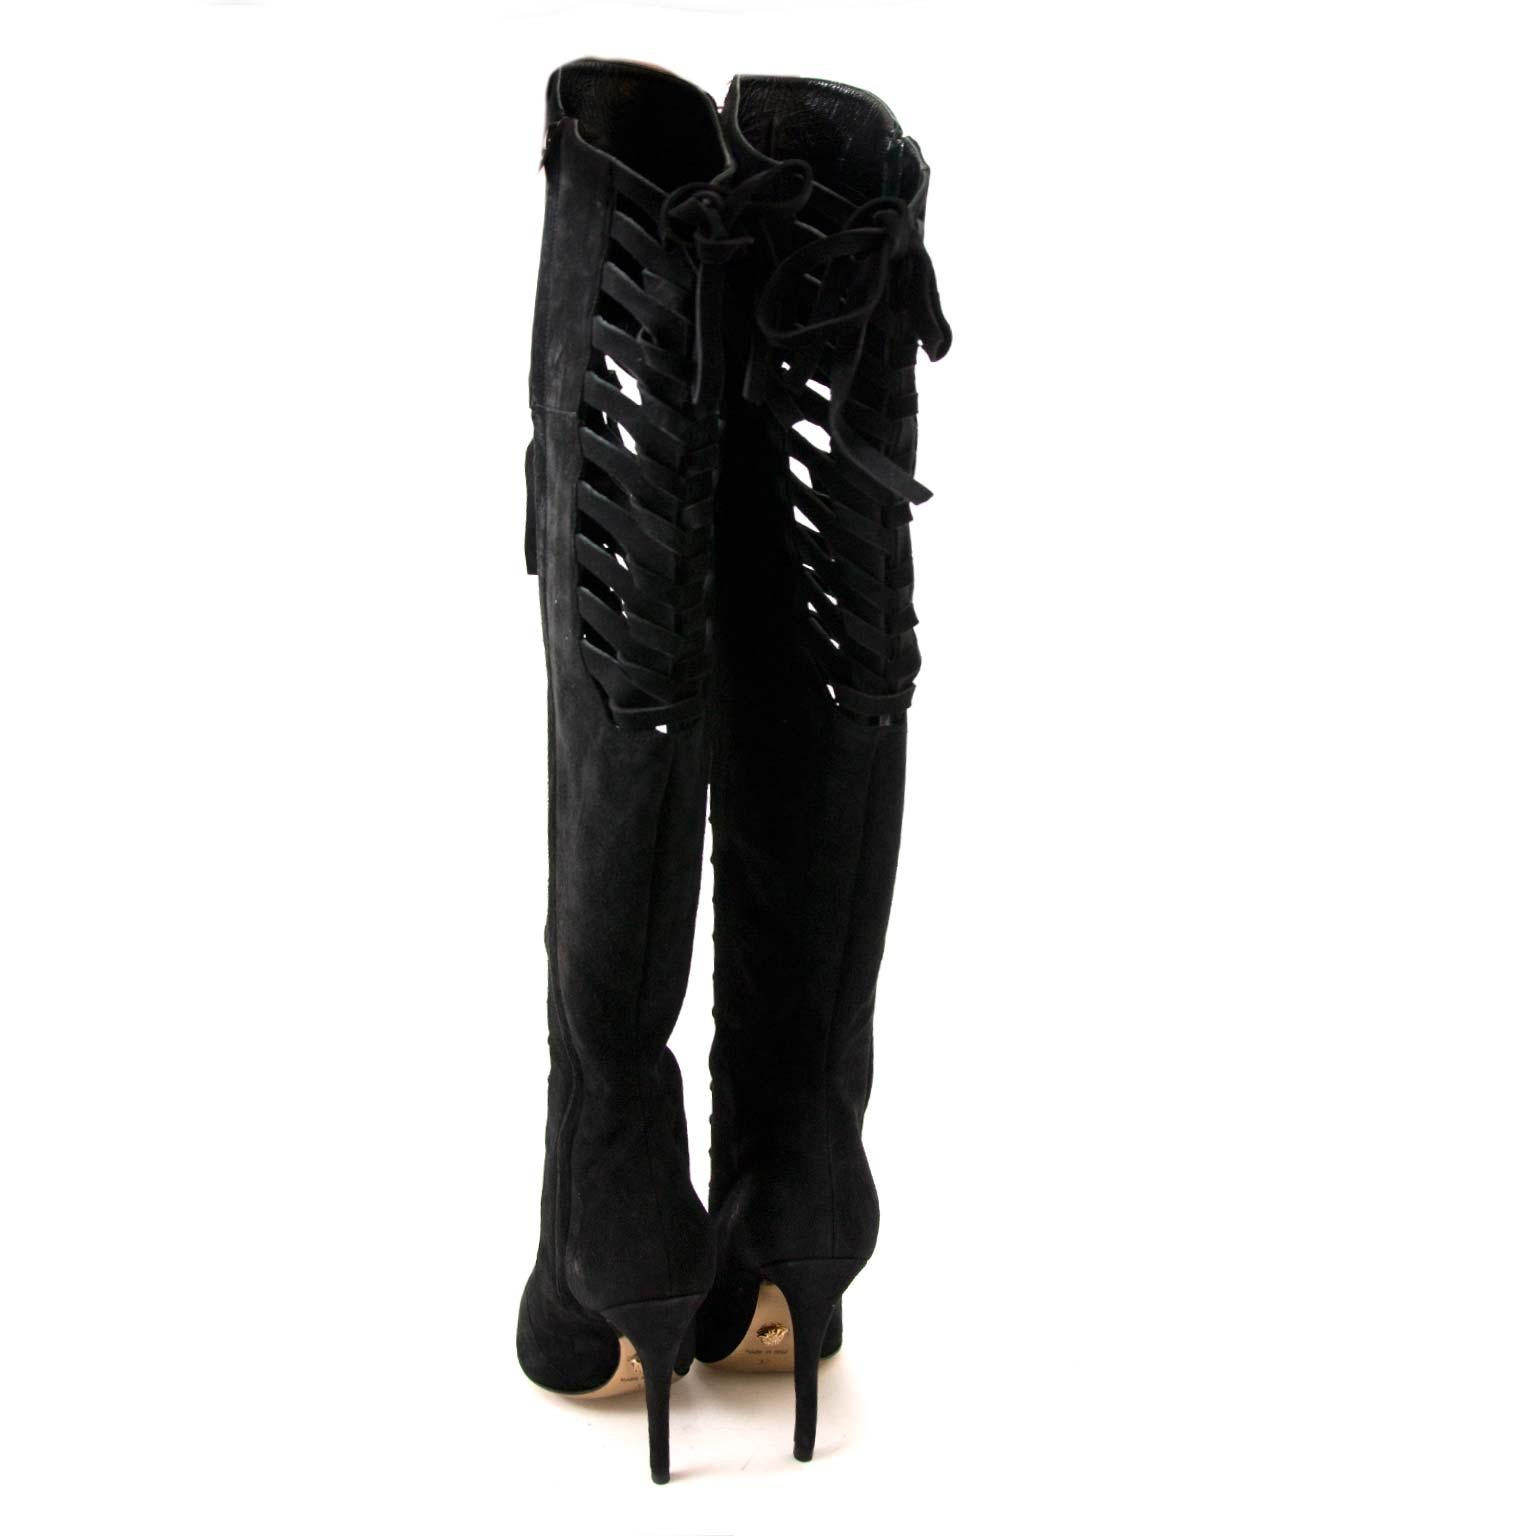 Koop Versace botten online bij labellov vintage fashion webshop